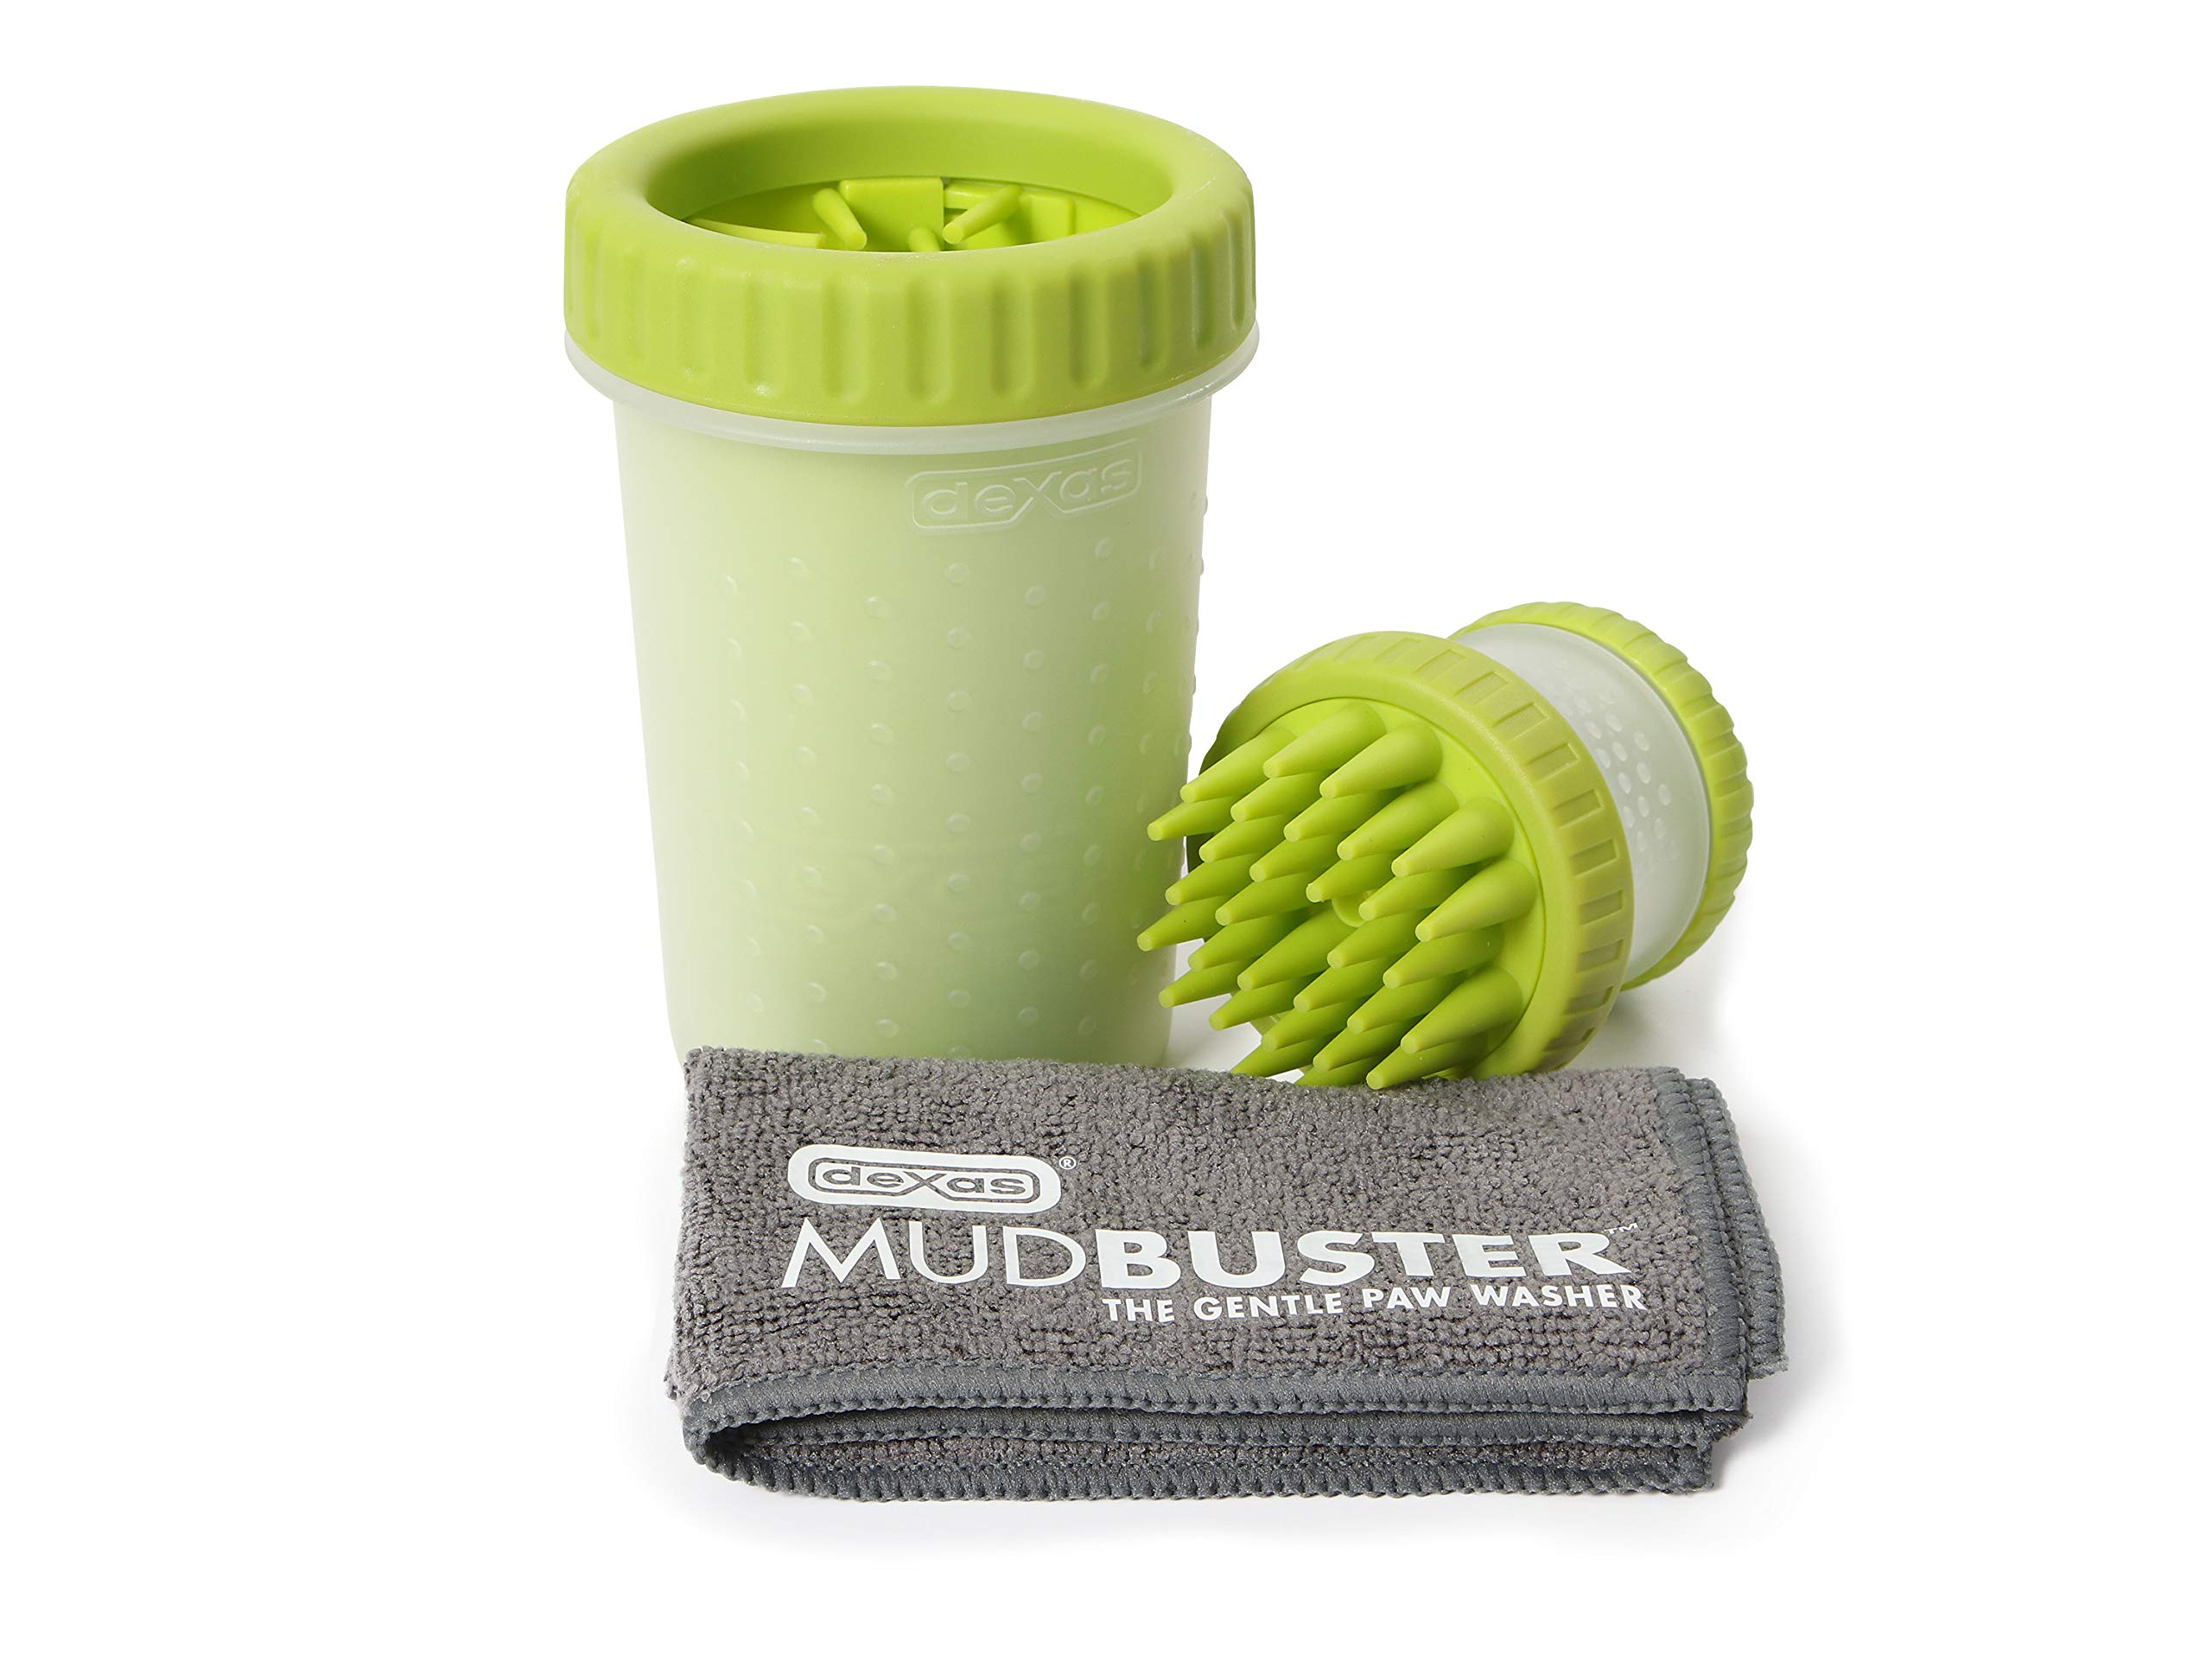 Dexas PW710730383Q Medium Green MudBuster, ScrubBuster and Towel